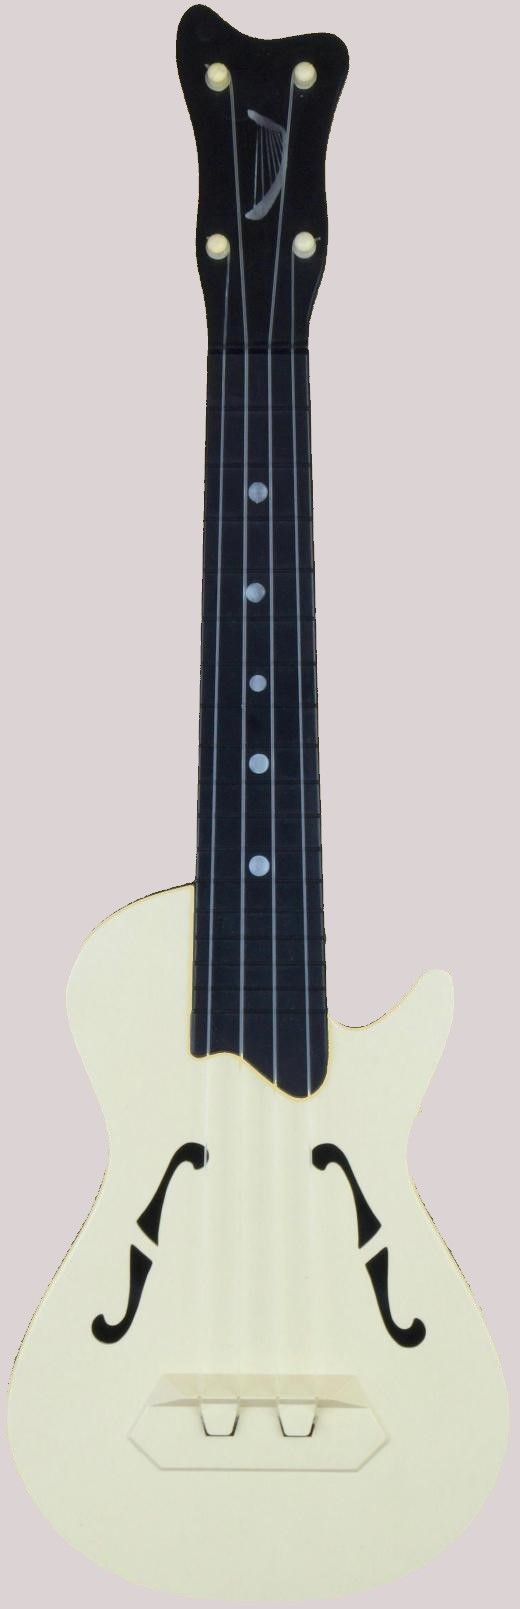 Carnival Combo Guitar